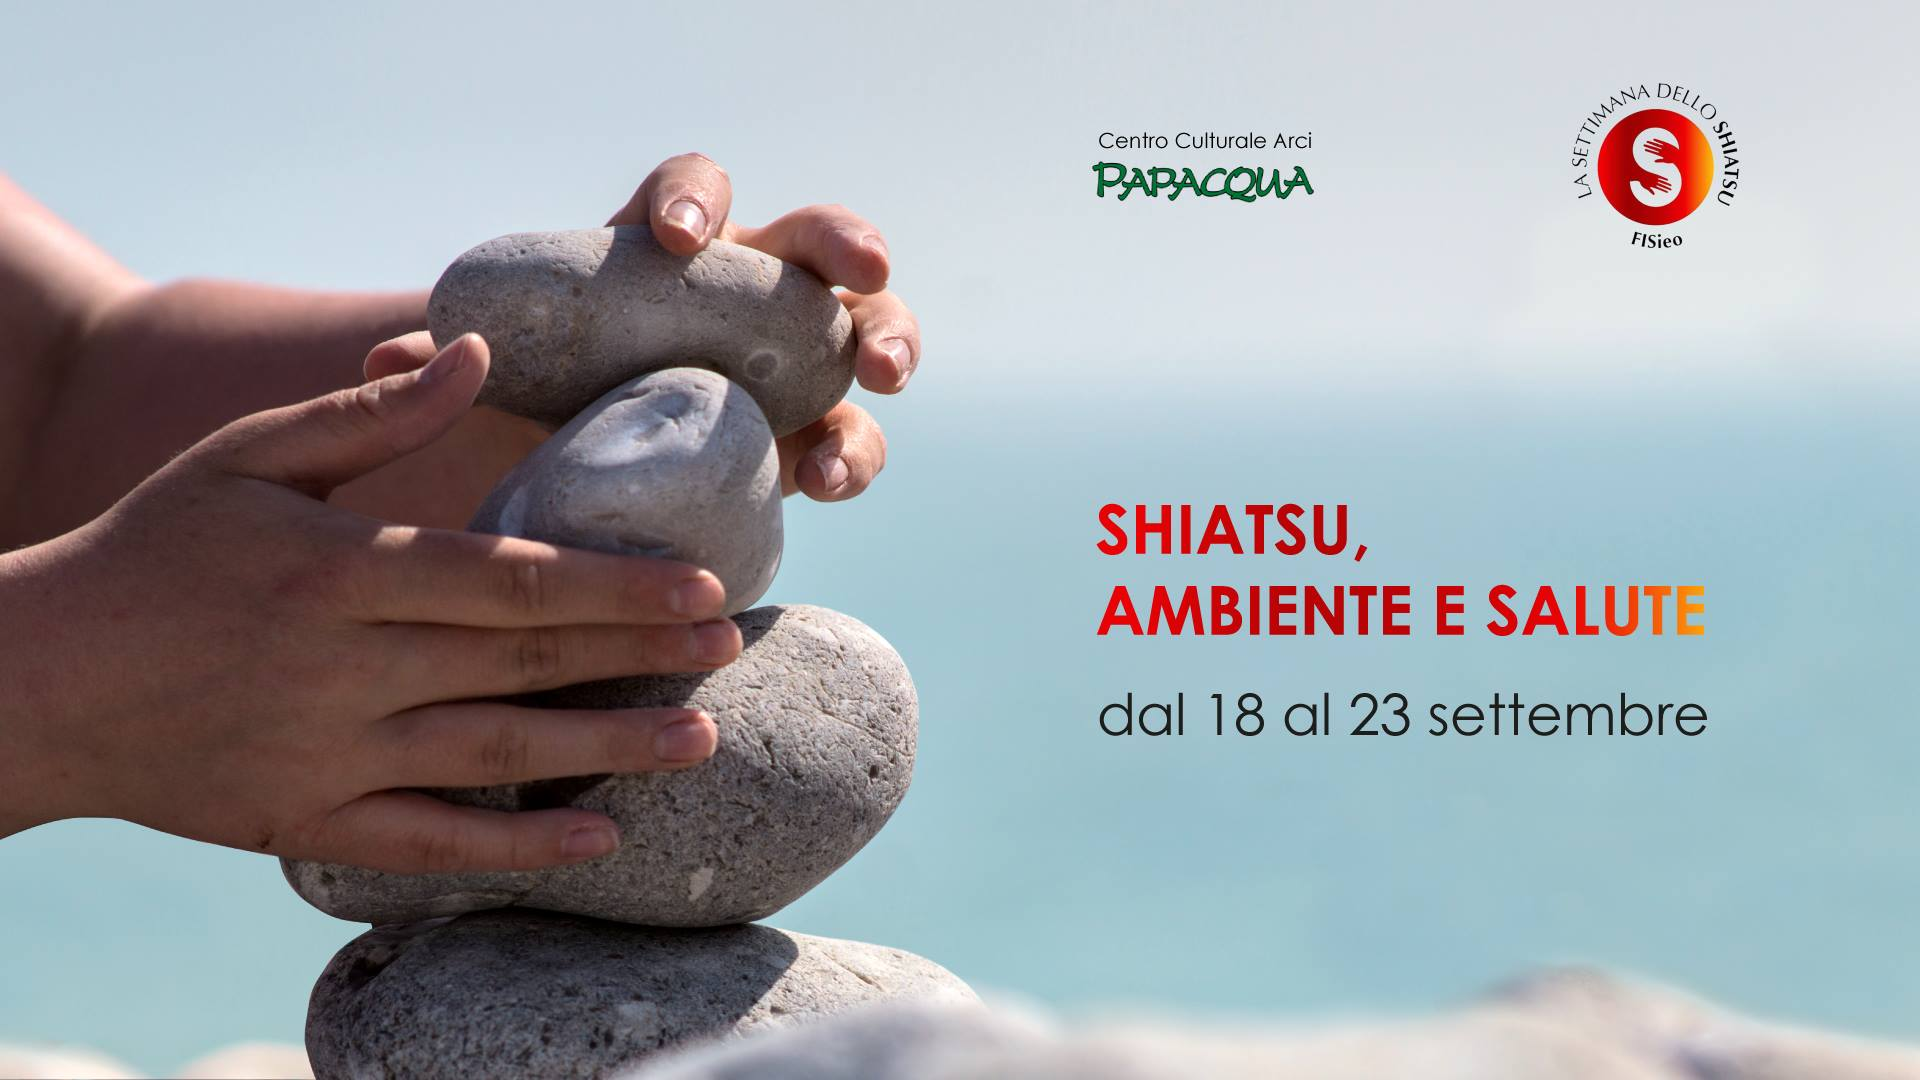 Shiatsu, ambiente e salute